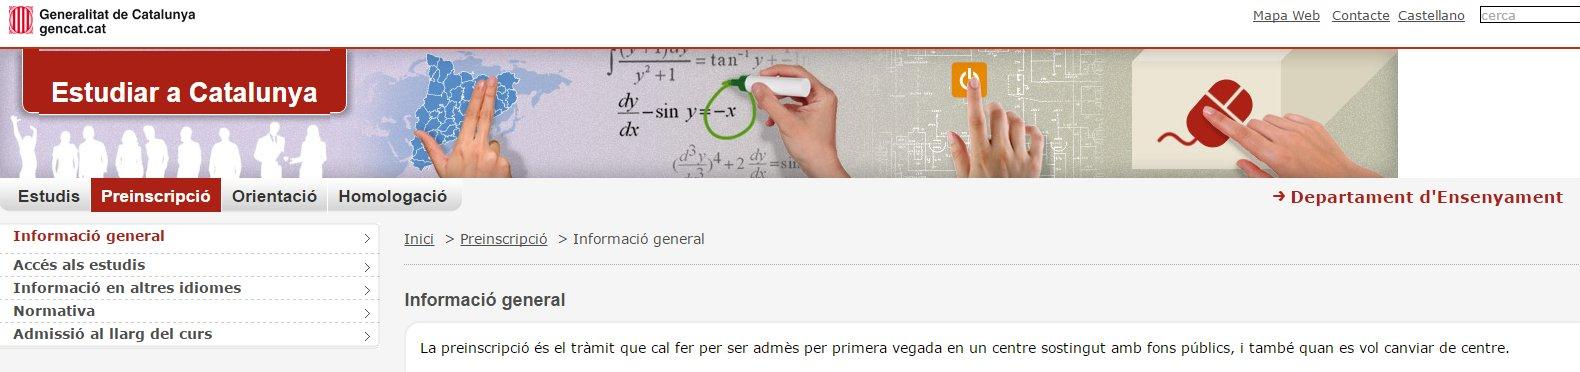 http://queestudiar.gencat.cat/ca/preinscripcio/informacio_general/